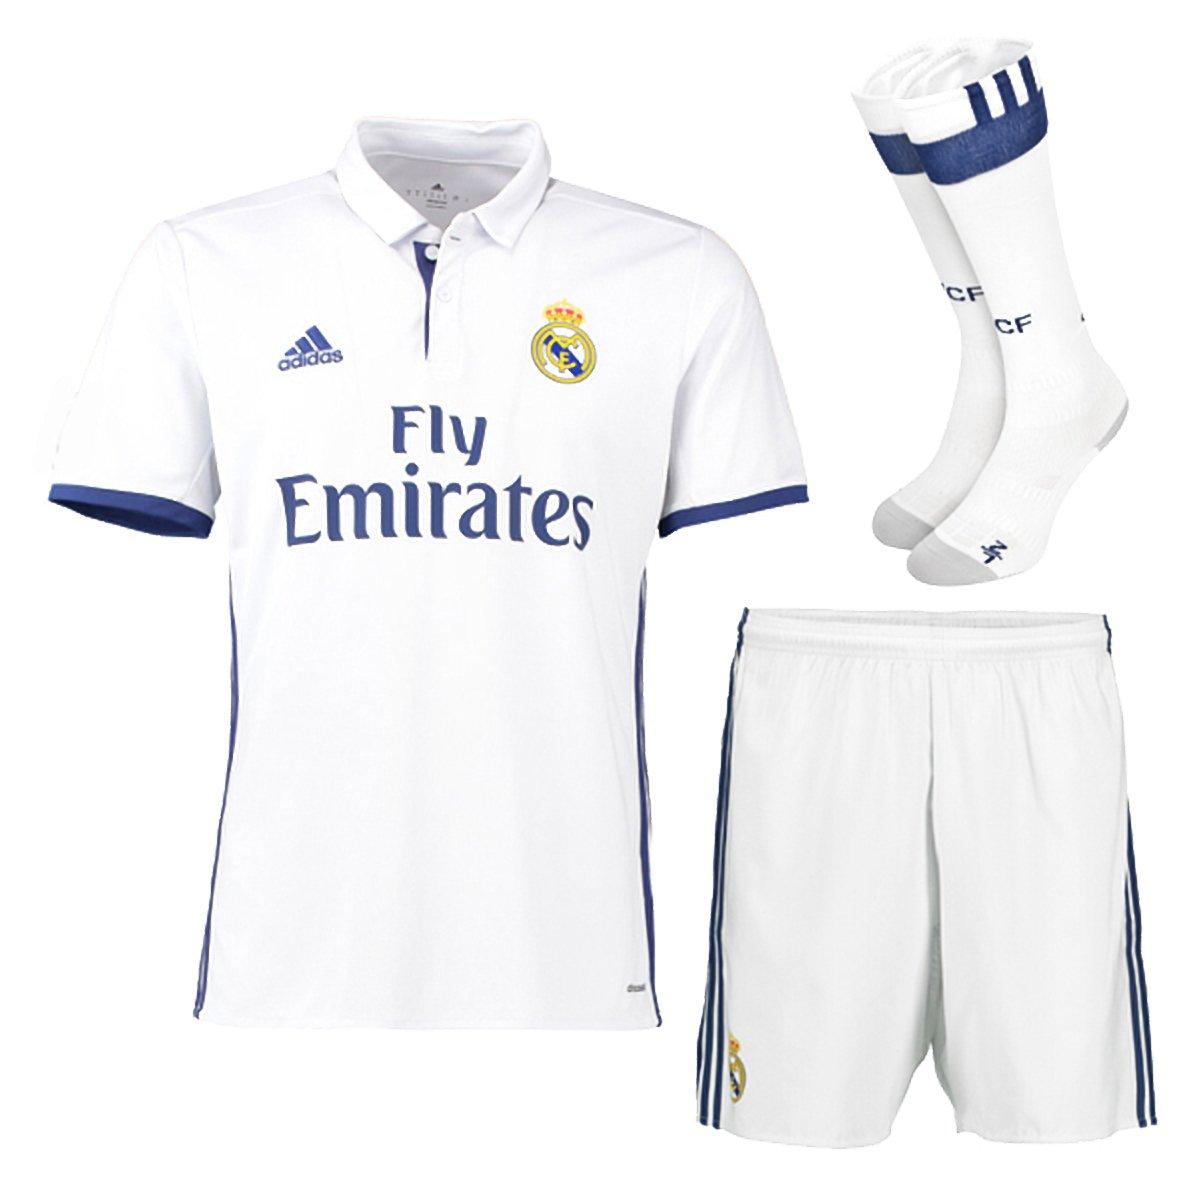 Real Madrid FC Home Kit Kinder 2015–2016 Shirt Shorts und Socken